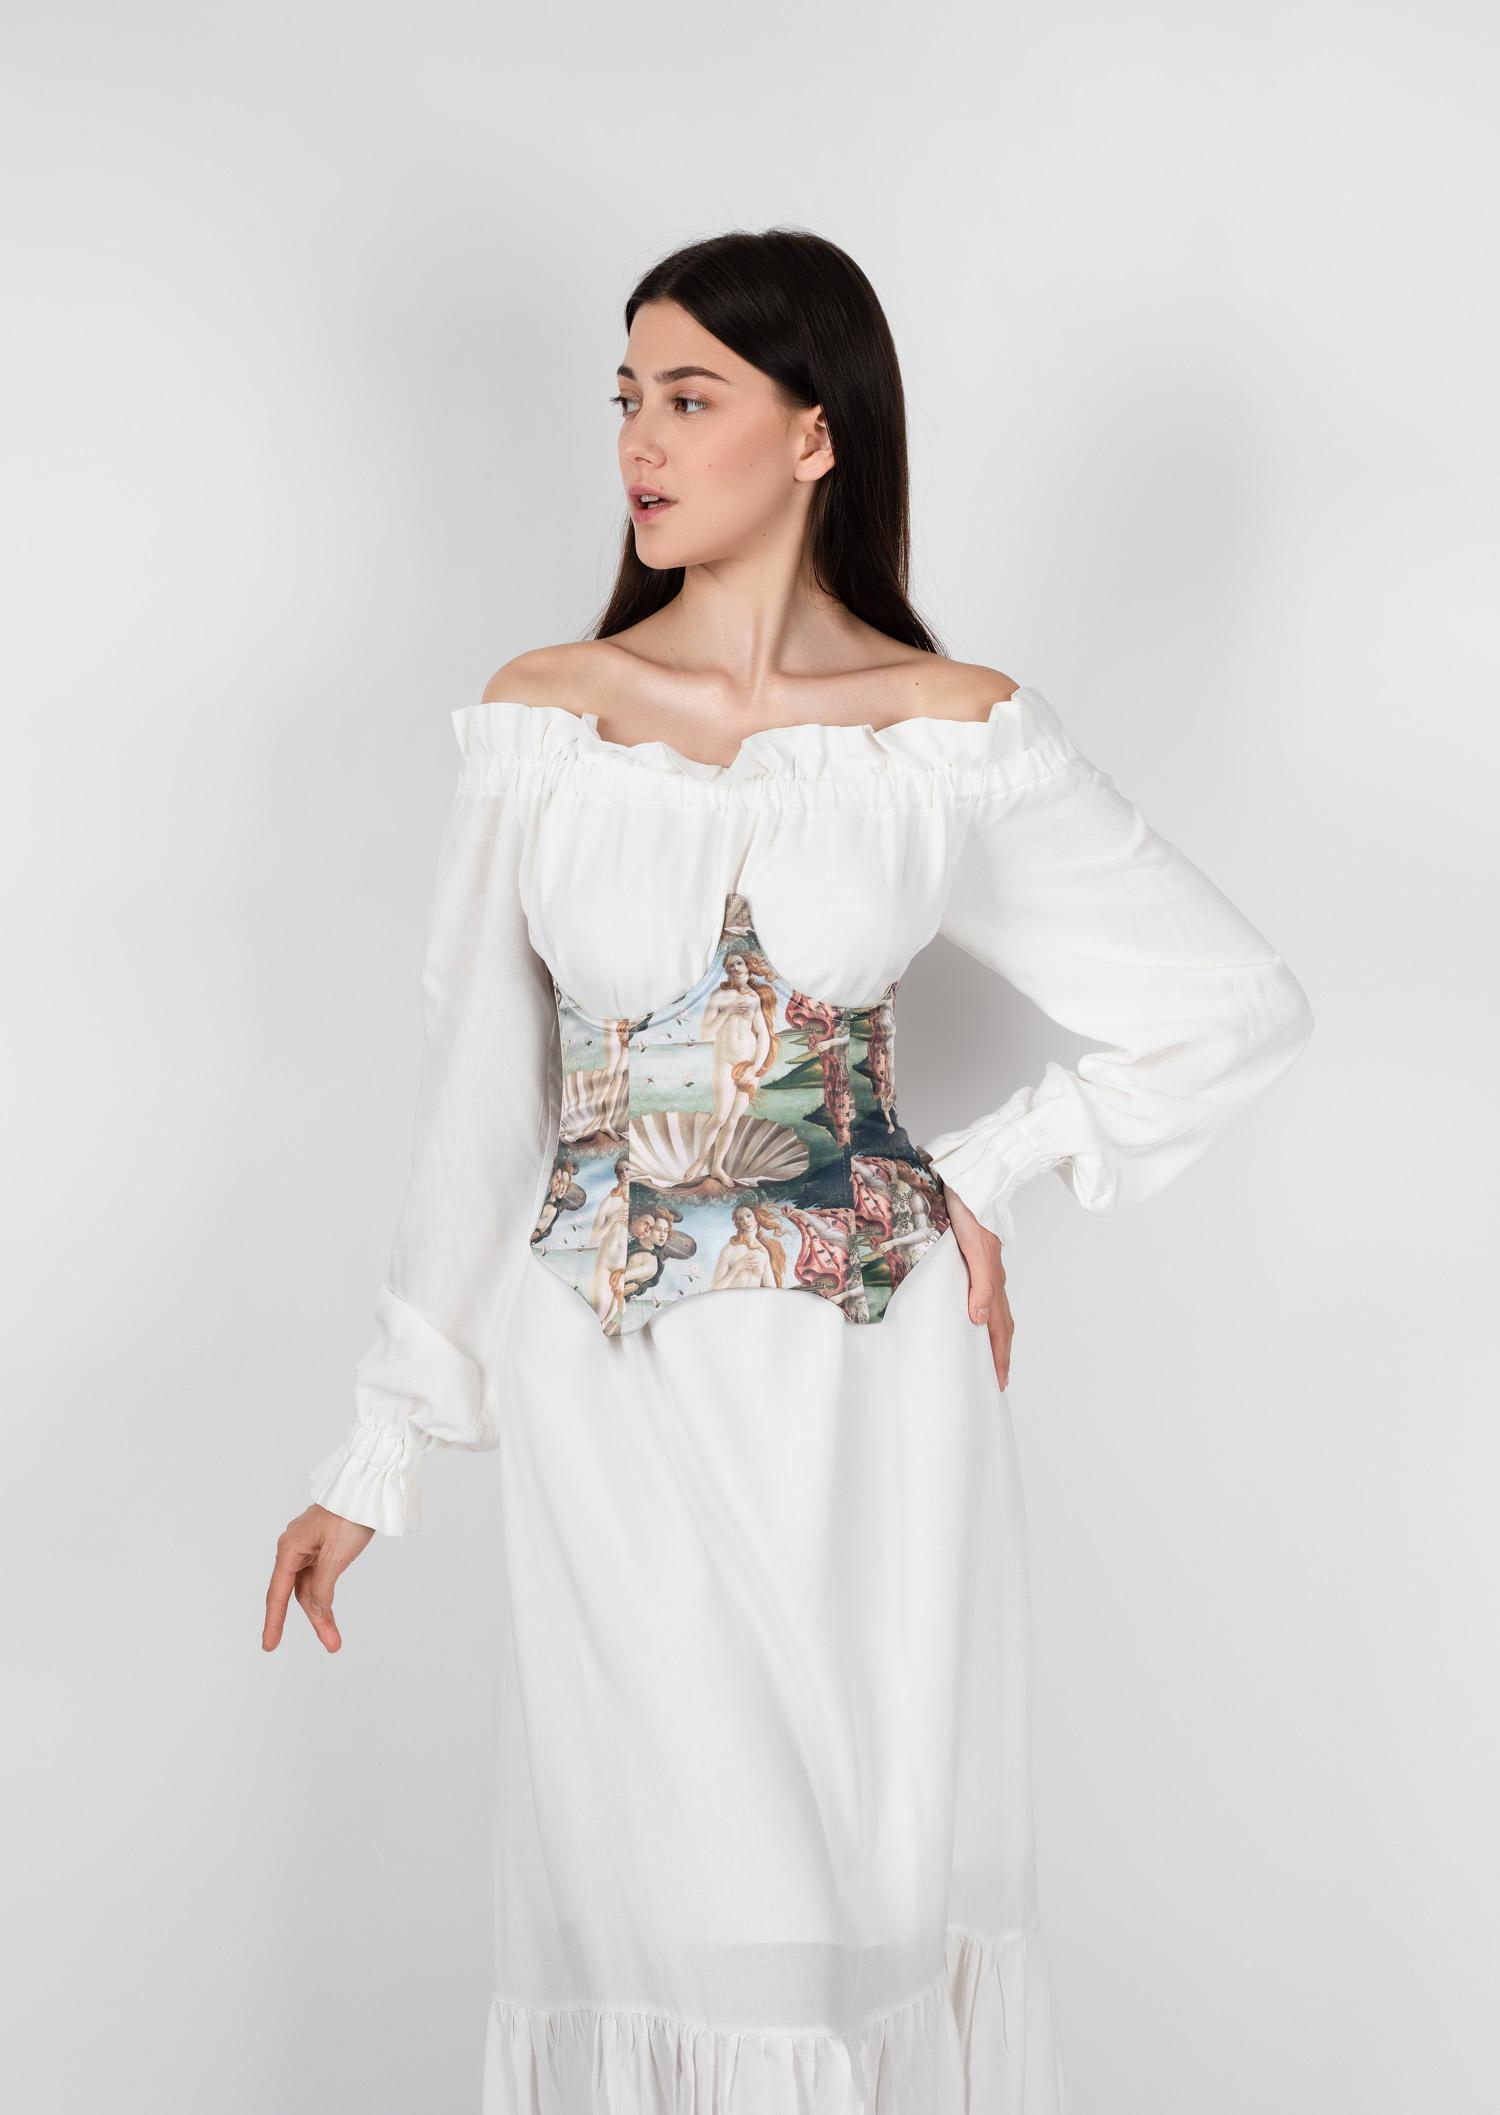 venus underbust corset historical vintage